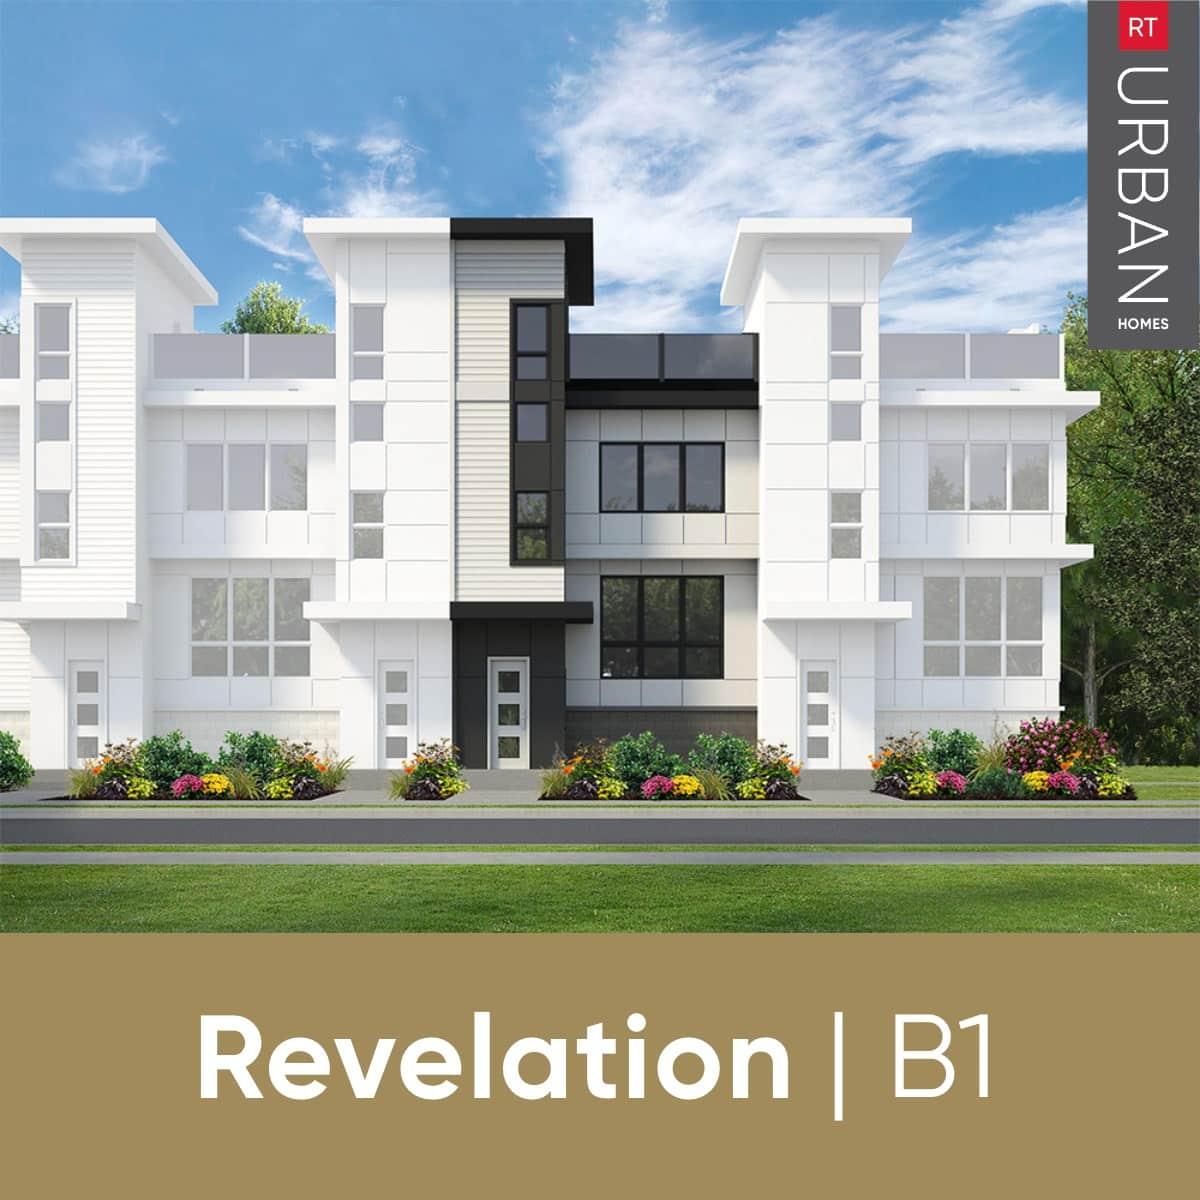 RT Urban Homes Revelation Collection – Elevation Of Floorplan B1